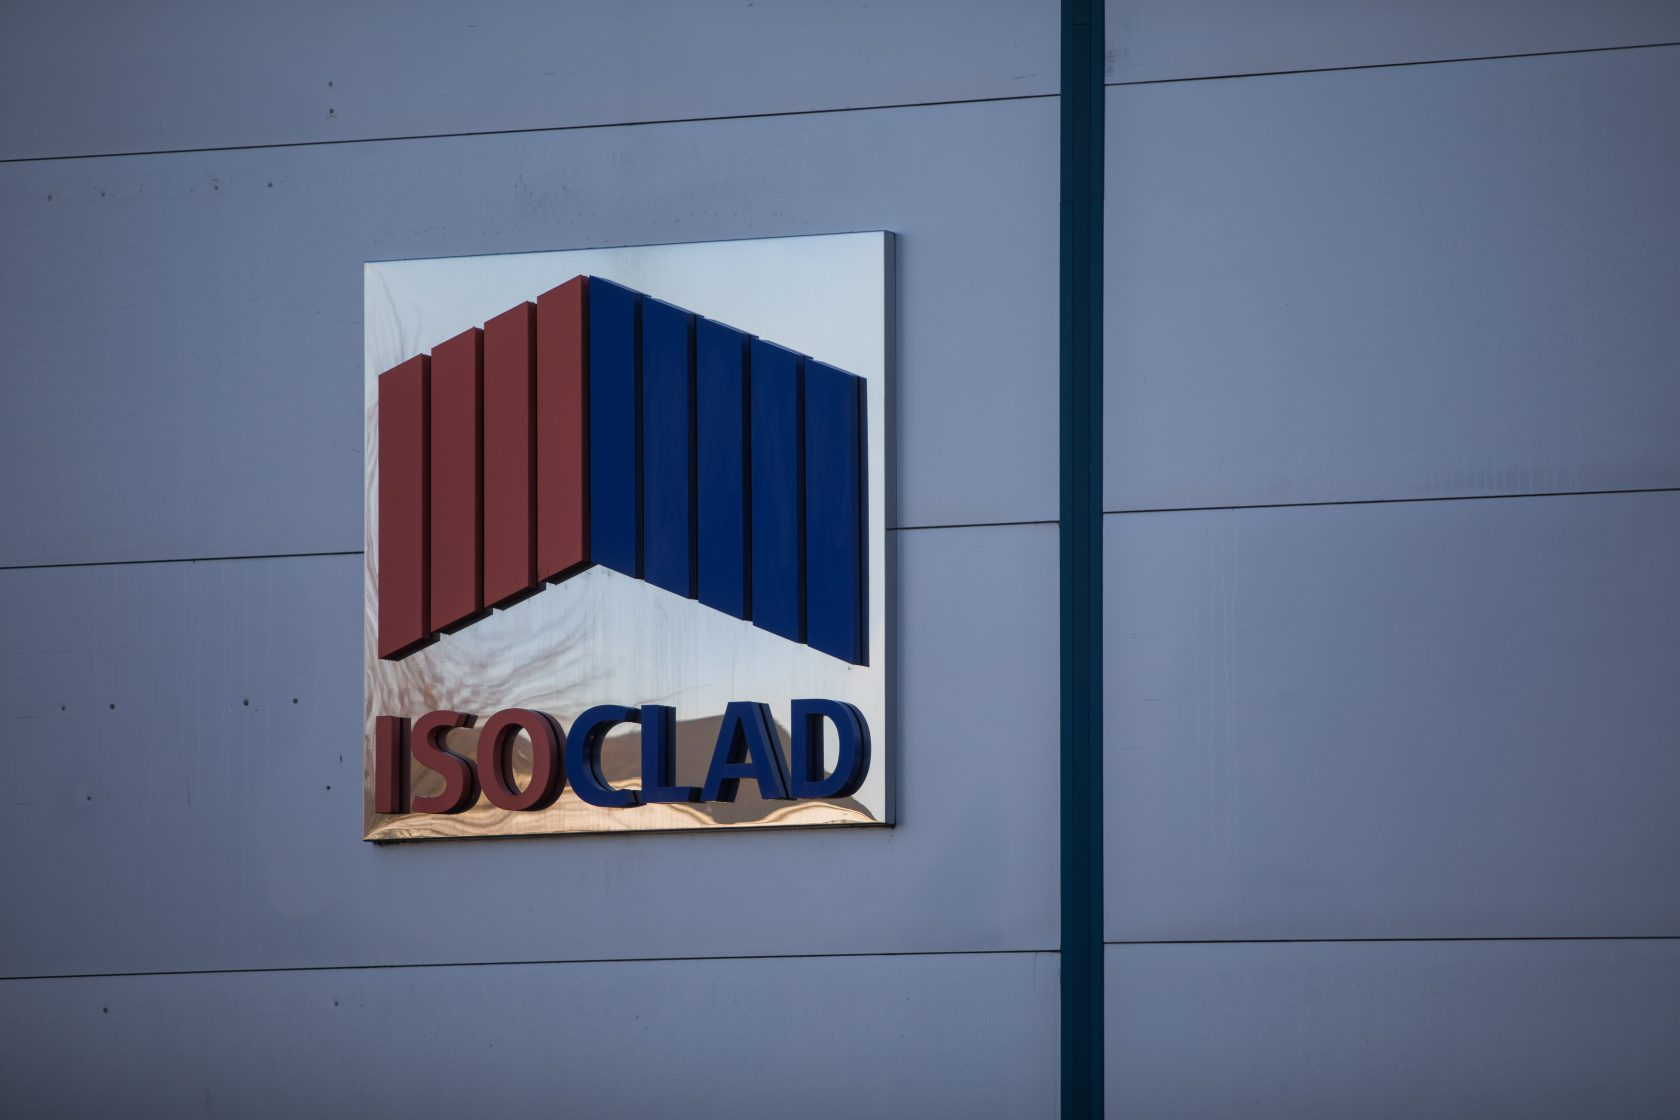 Isoclad Ltd